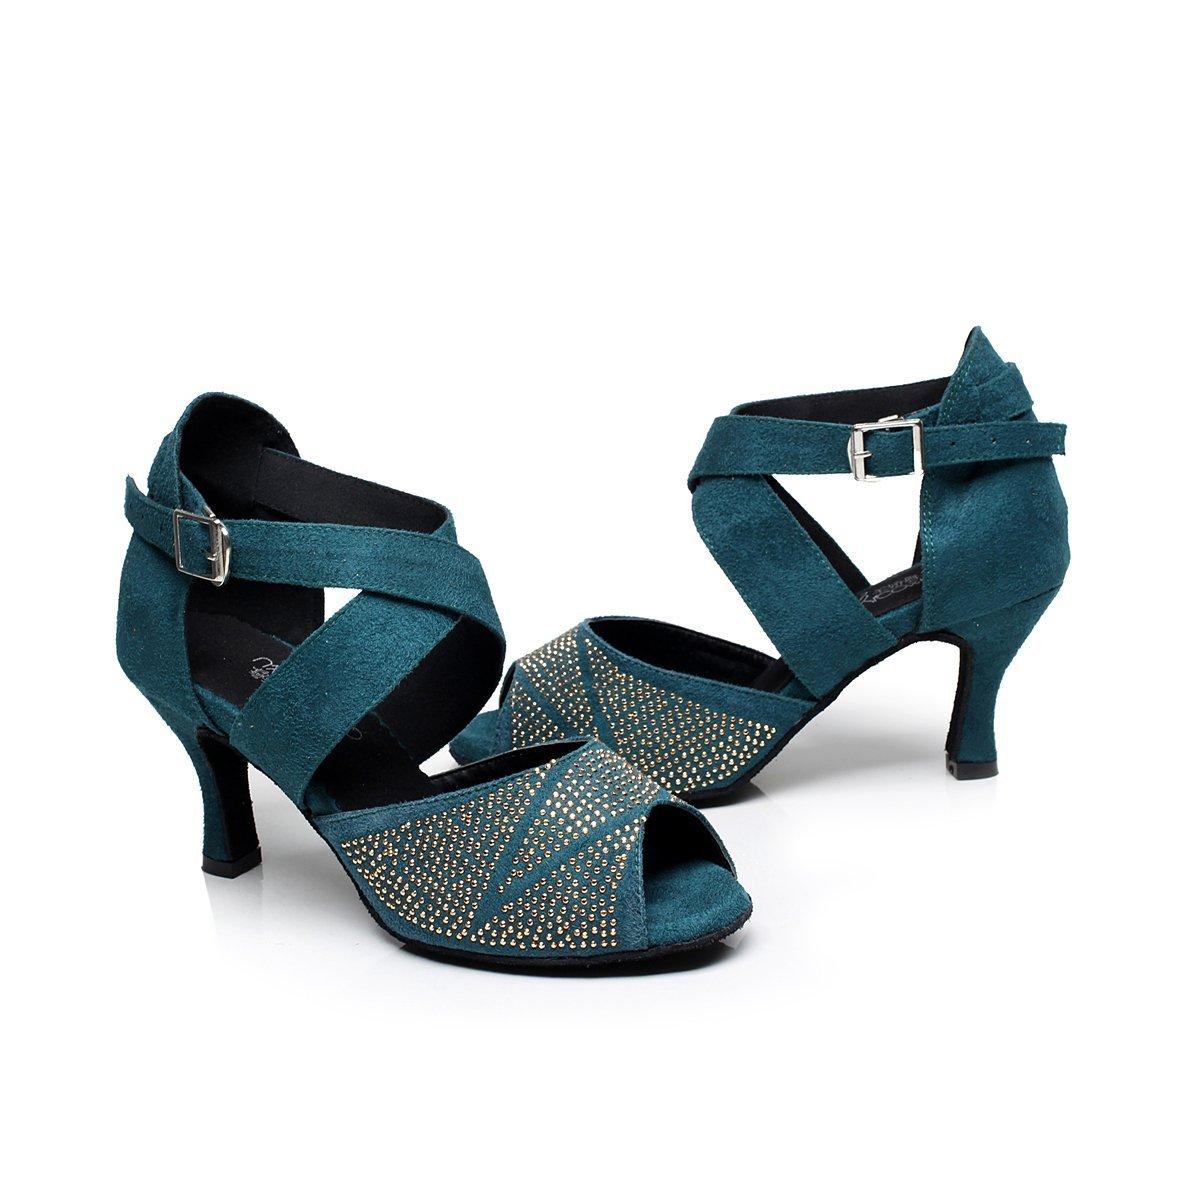 US9, Navy BAYSA Women Fashion Rhinestone Latin Ballroom Salsa Tango Dance Shoe